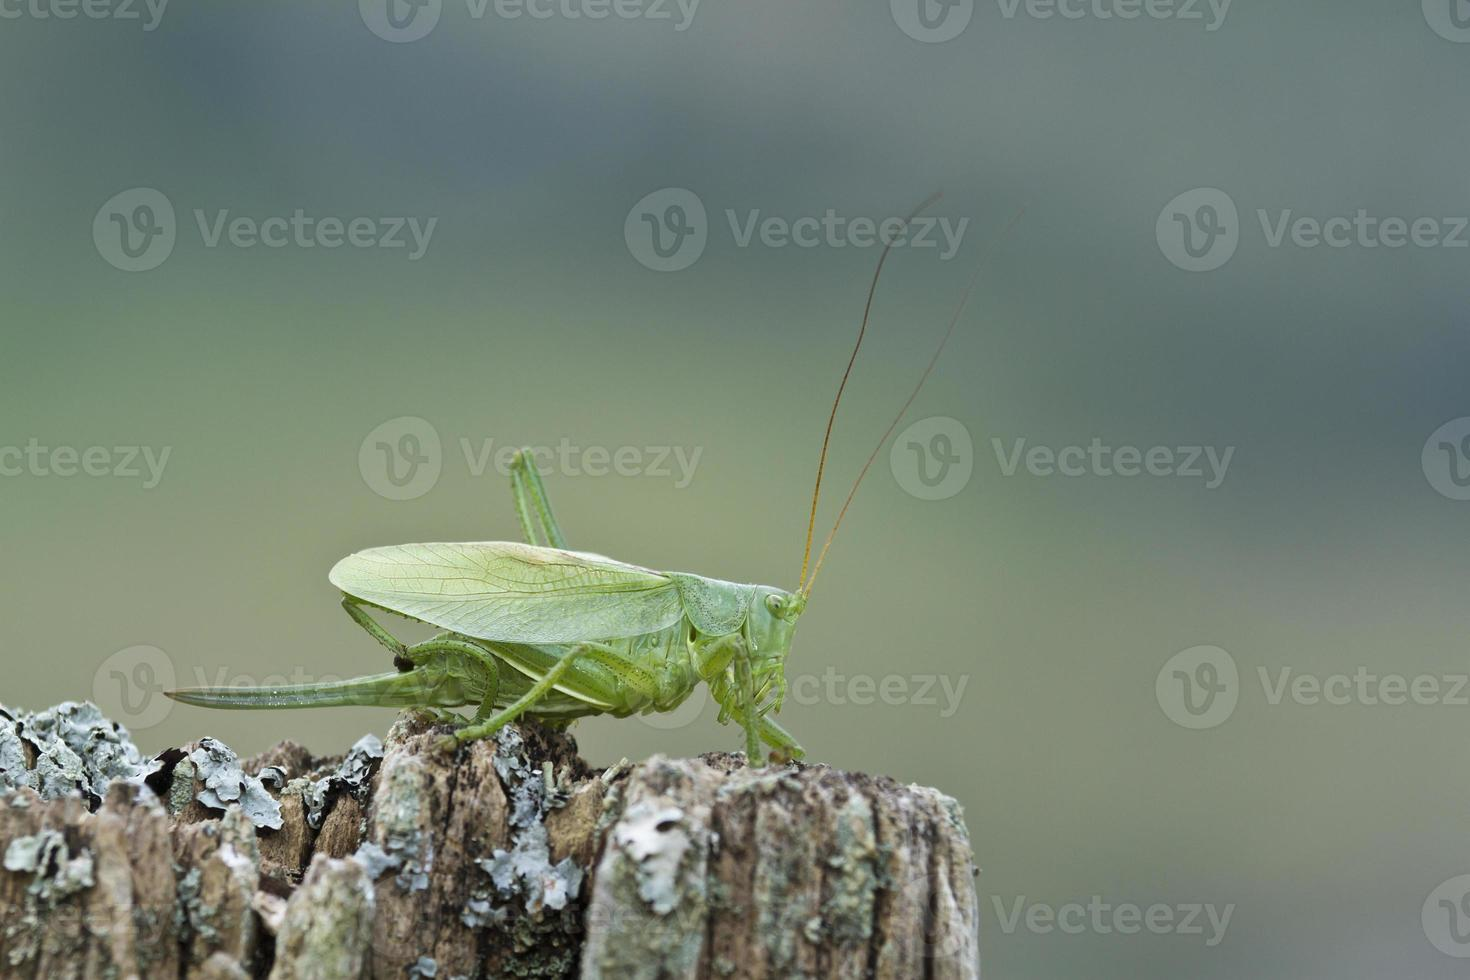 grote groene bush-cricket specie tettigonia viridissima, Frankrijk foto